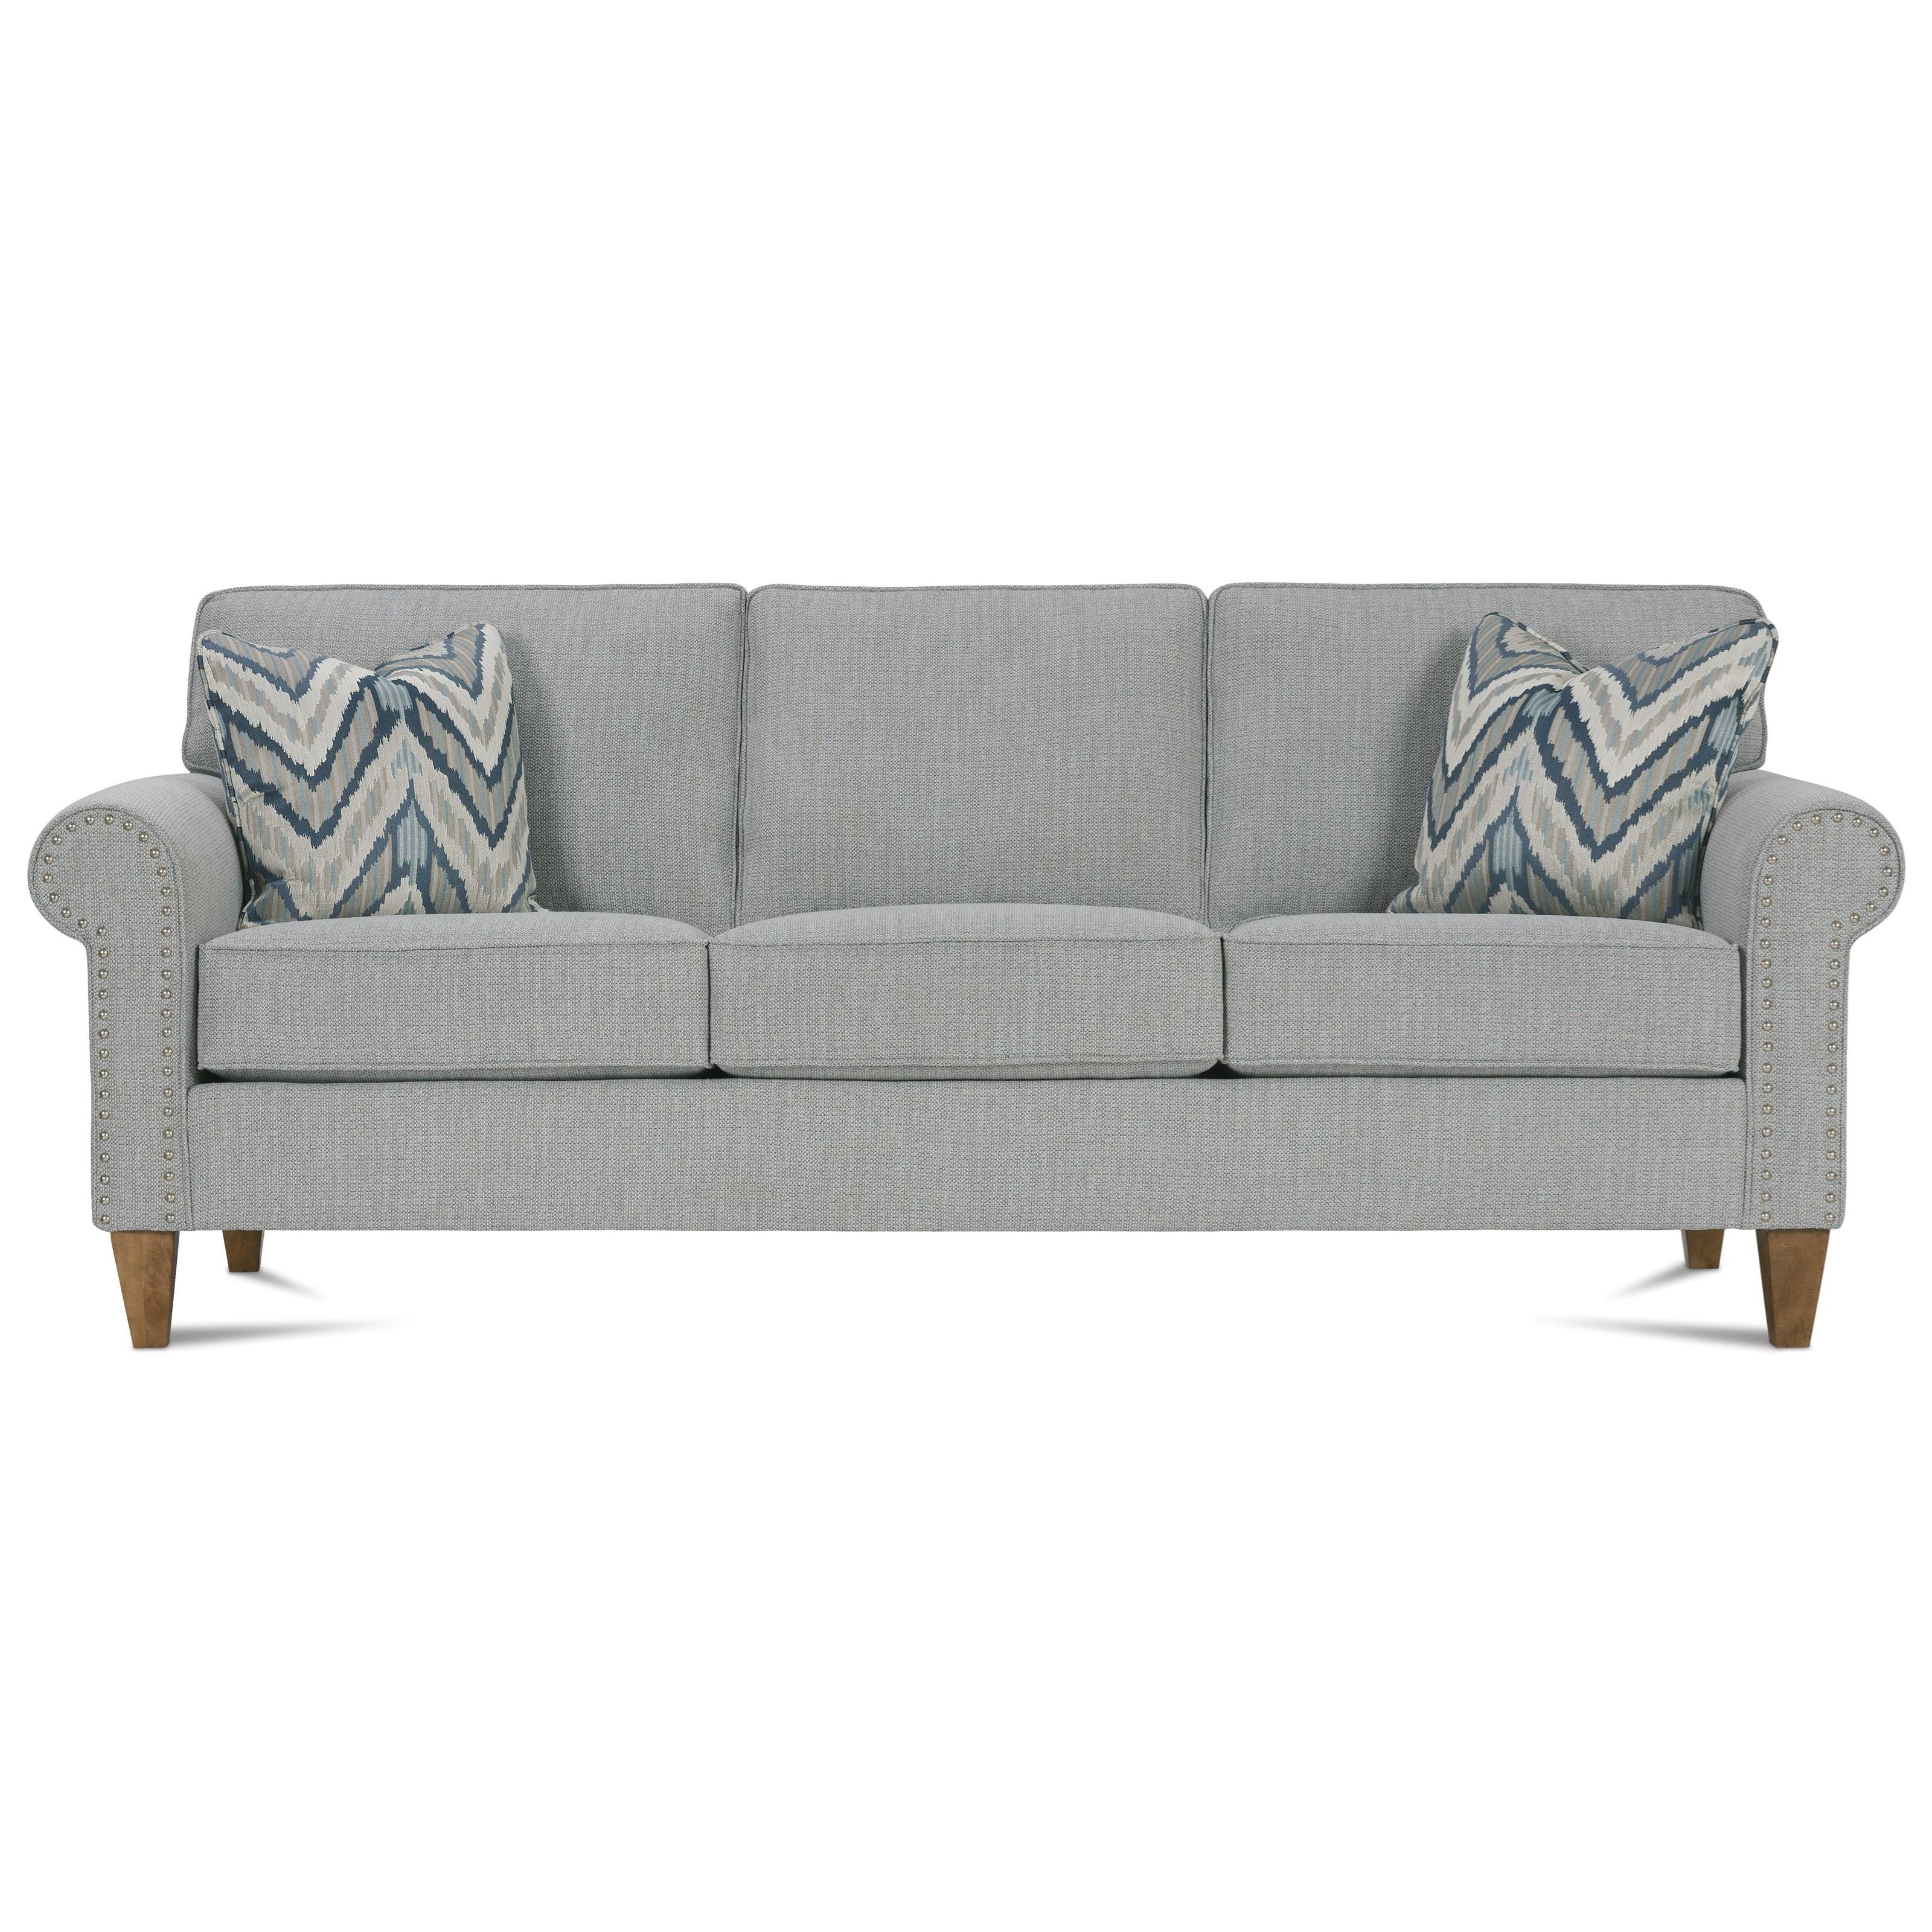 Bleeker - RXO Sofa by Rowe at Baer's Furniture